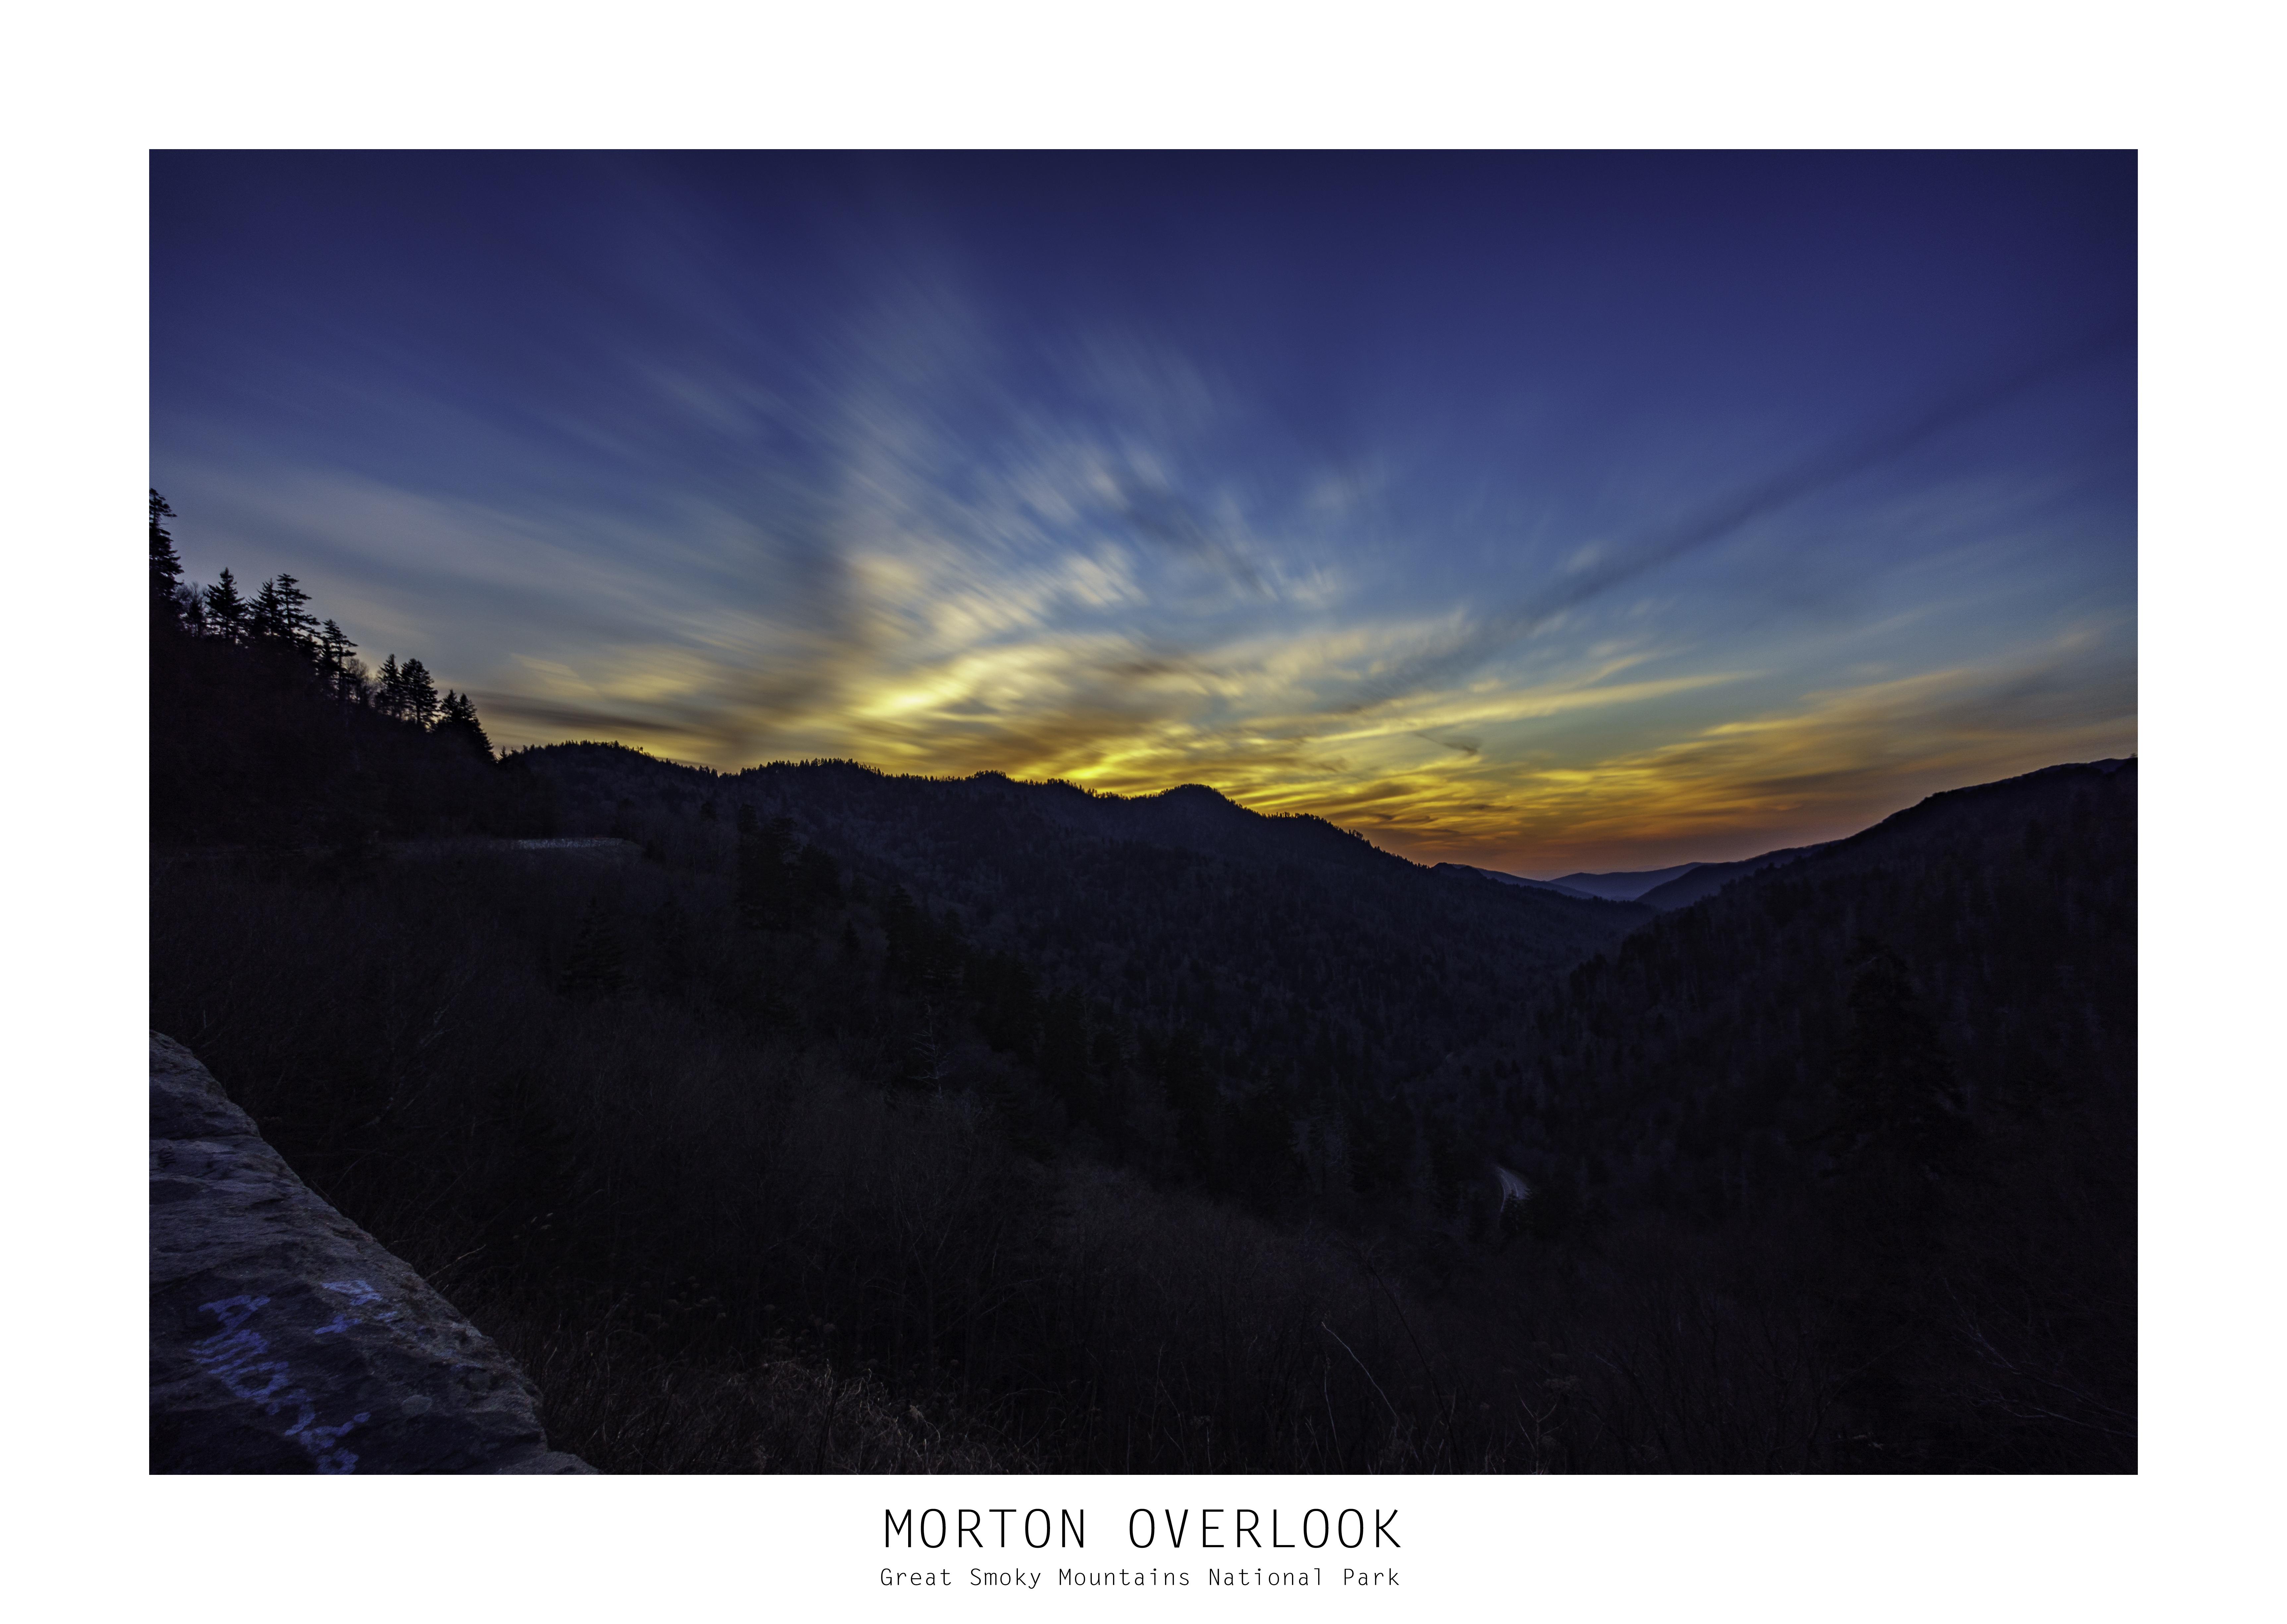 Must see Wallpaper Love Scenery - sunlight-landscape-mountains-sunset-hill-love-sky-park-clouds-sunrise-evening-morning-horizon-atmosphere-dusk-happy-peaceful-mount-scenery-Tennessee-ridge-cloud-tree-mountain-dawn-south-highland-slowshutter-mountain-range-tamron1024mm-meteorological-phenomenon-fell-sonya77ii-smokymountains-mortonoverlook-thegreatsmokymountains-stock-photography-849254  Gallery_51875.jpg